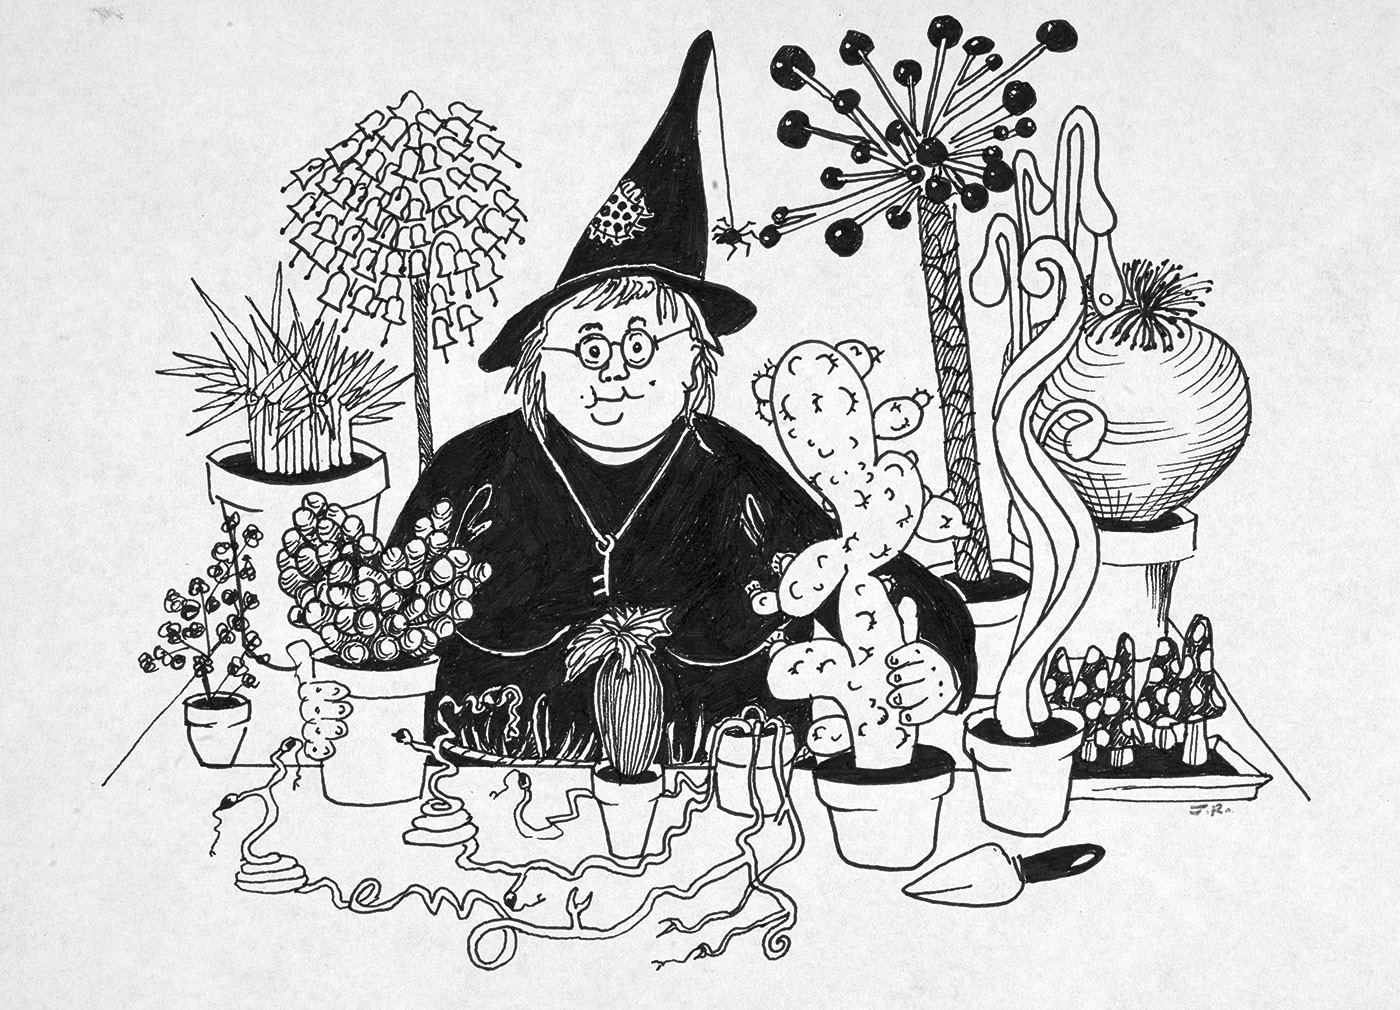 Professor Sprout (J.K. Rowling sketch)